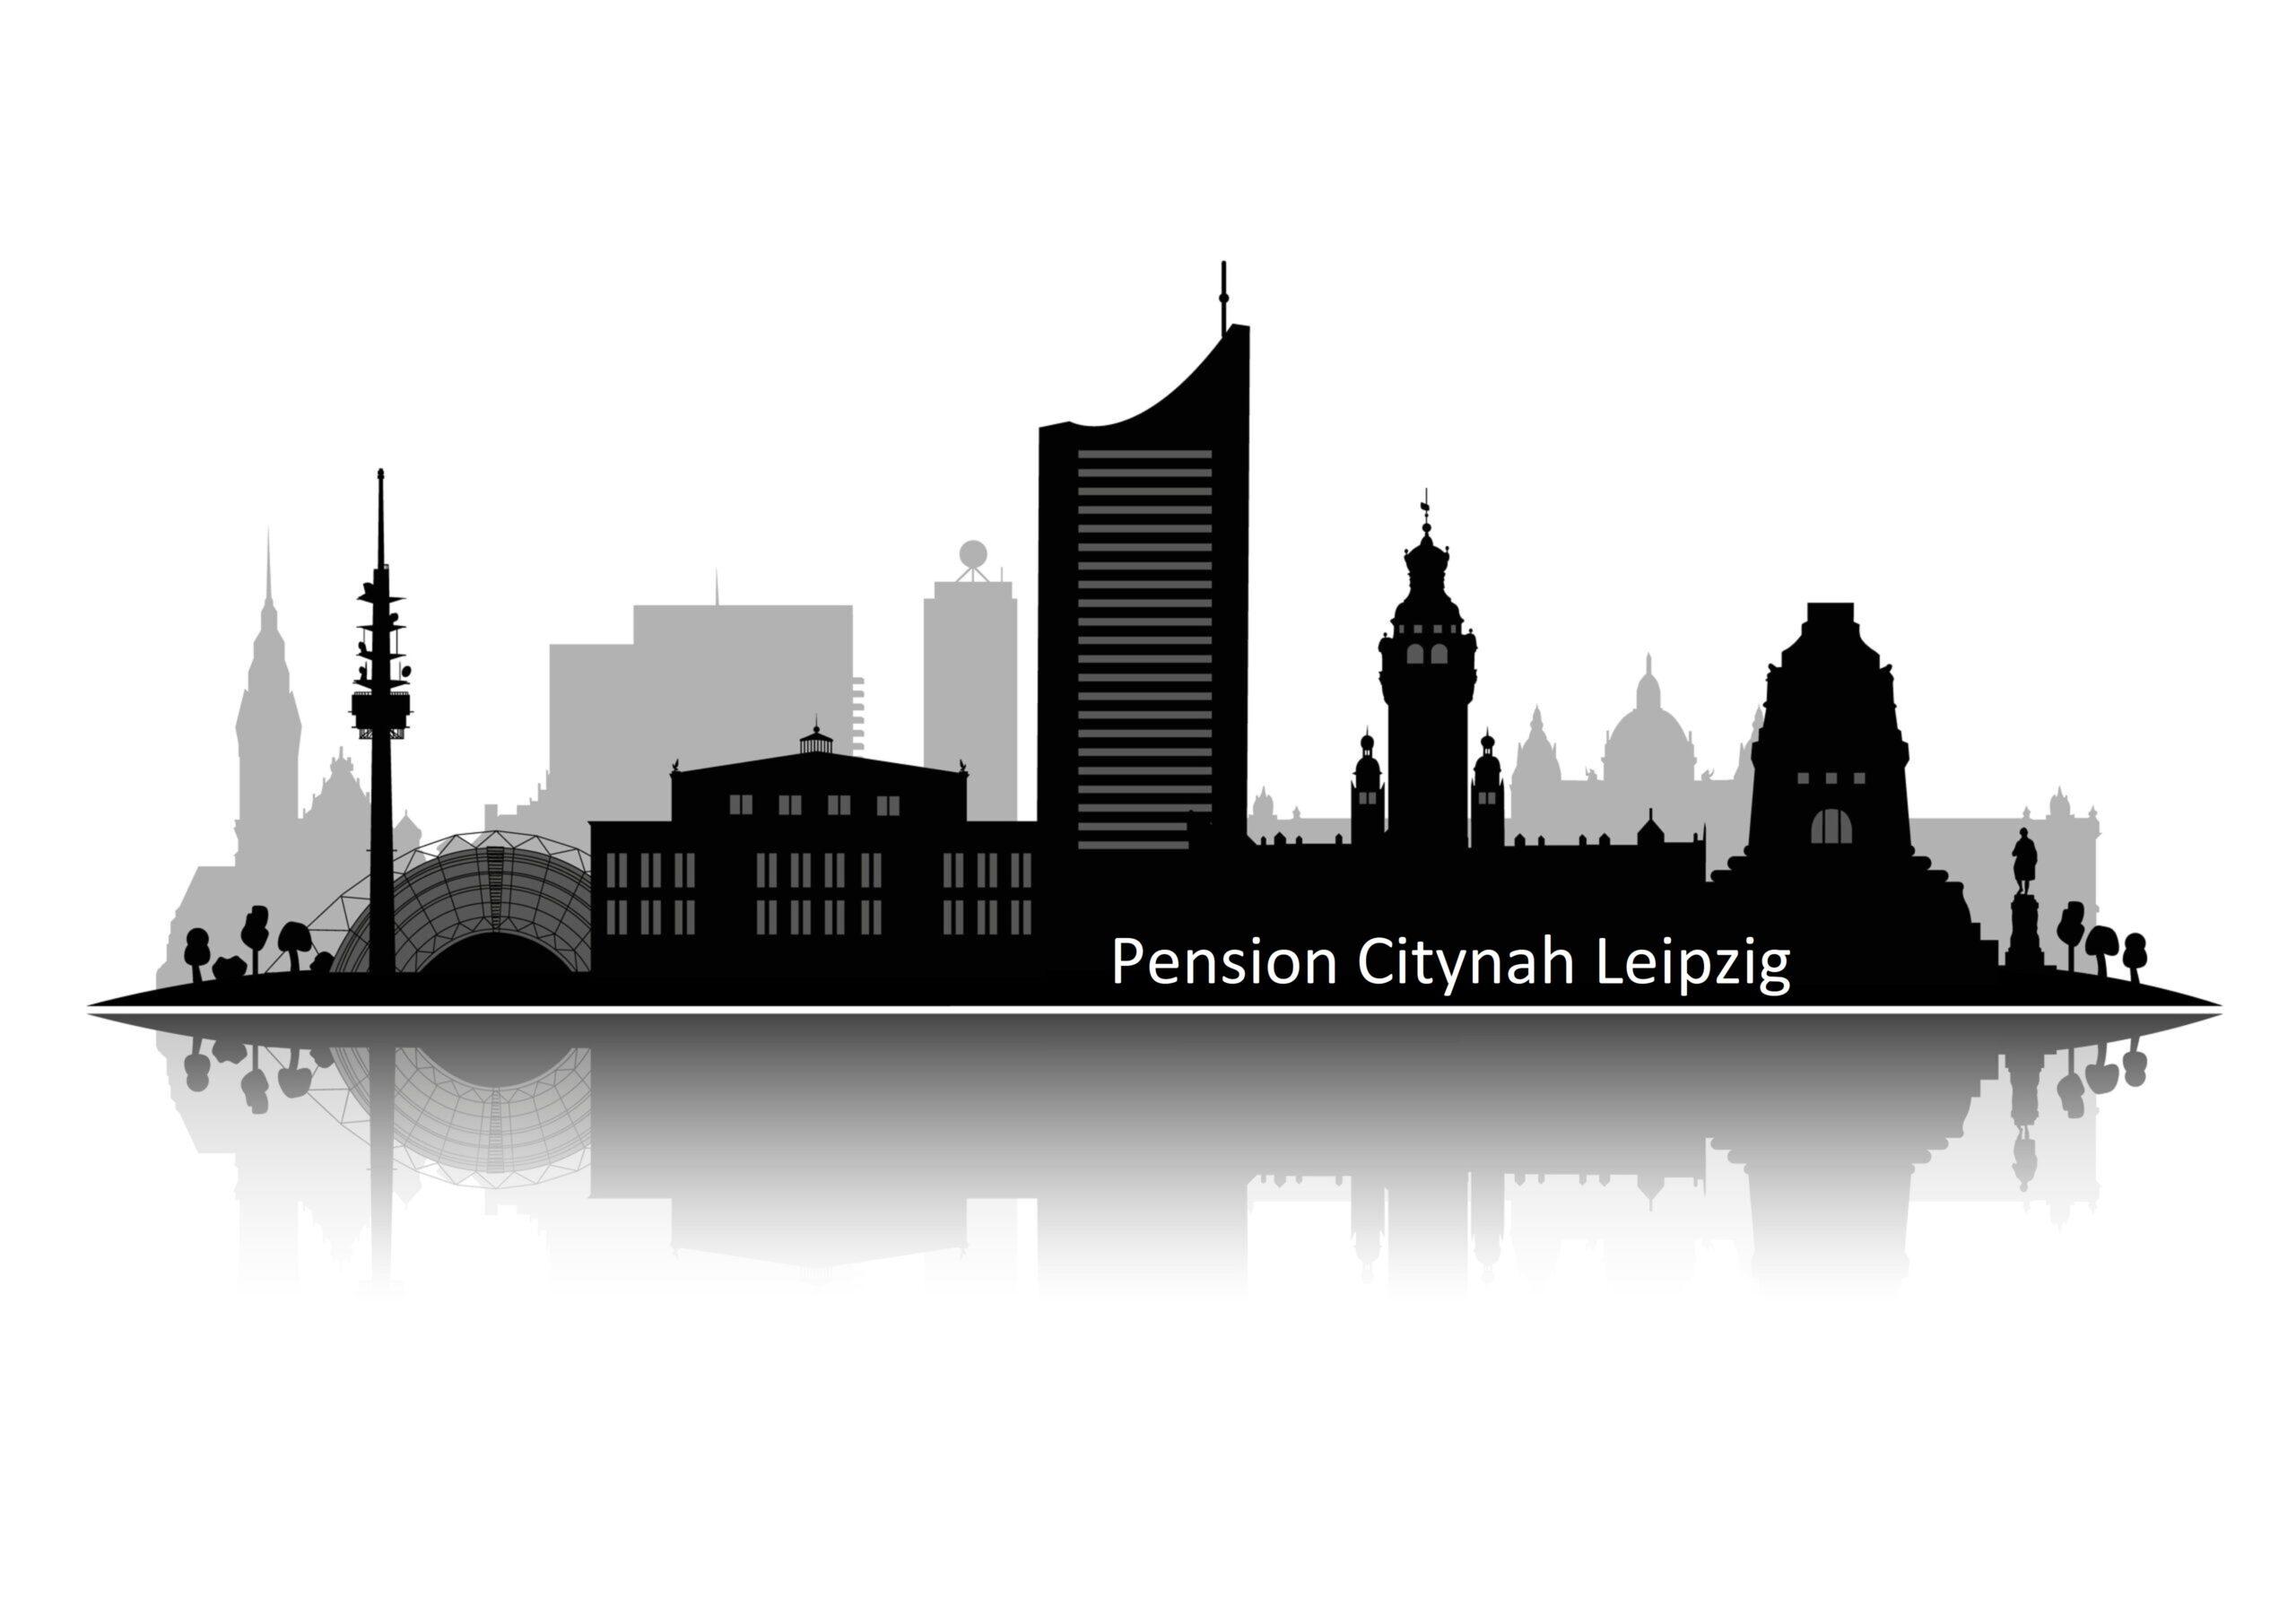 Pension Citynah Leipzig